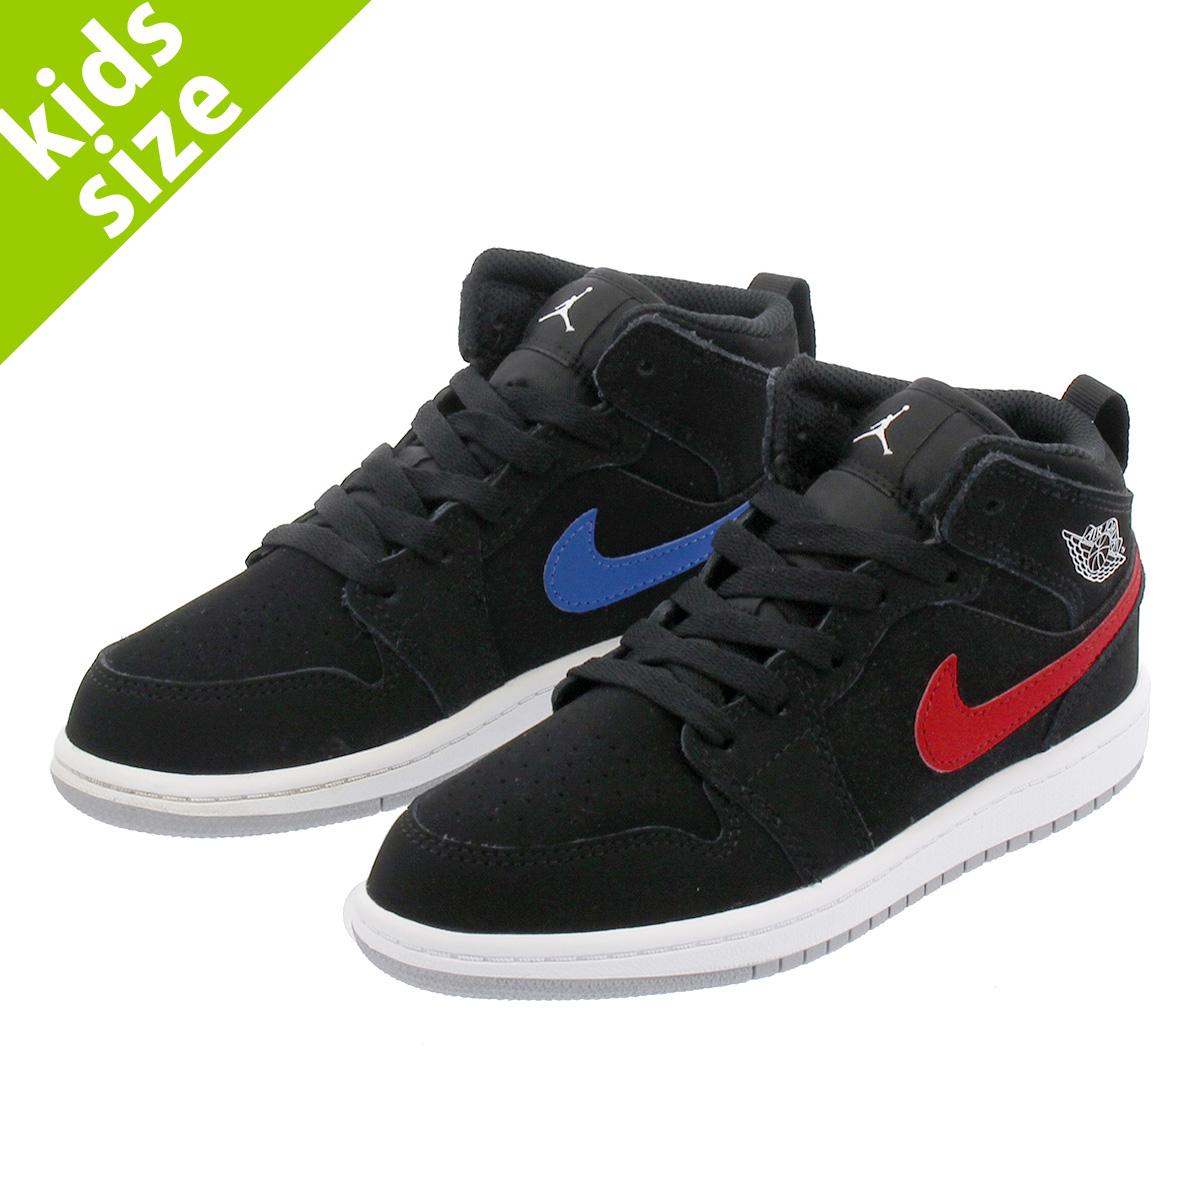 1b13d3dcd3eb53 NIKE AIR JORDAN 1 MID PS Nike Air Jordan 1 mid PS BLACK WHITE RED YELLOW BLUE GREEN  640